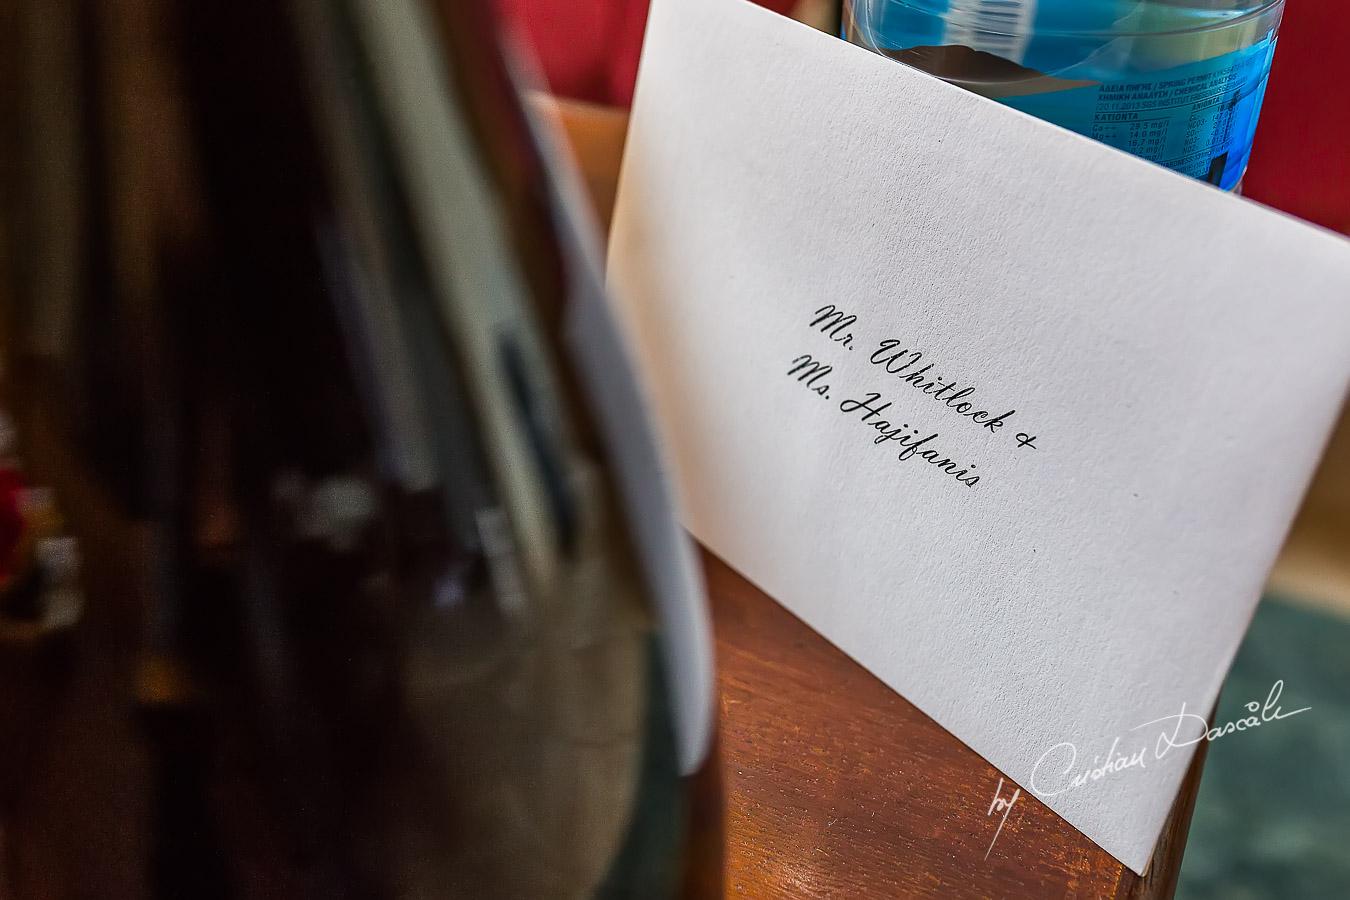 Wedding Details captured at Elysium Hotel in Paphos, Cyprus.